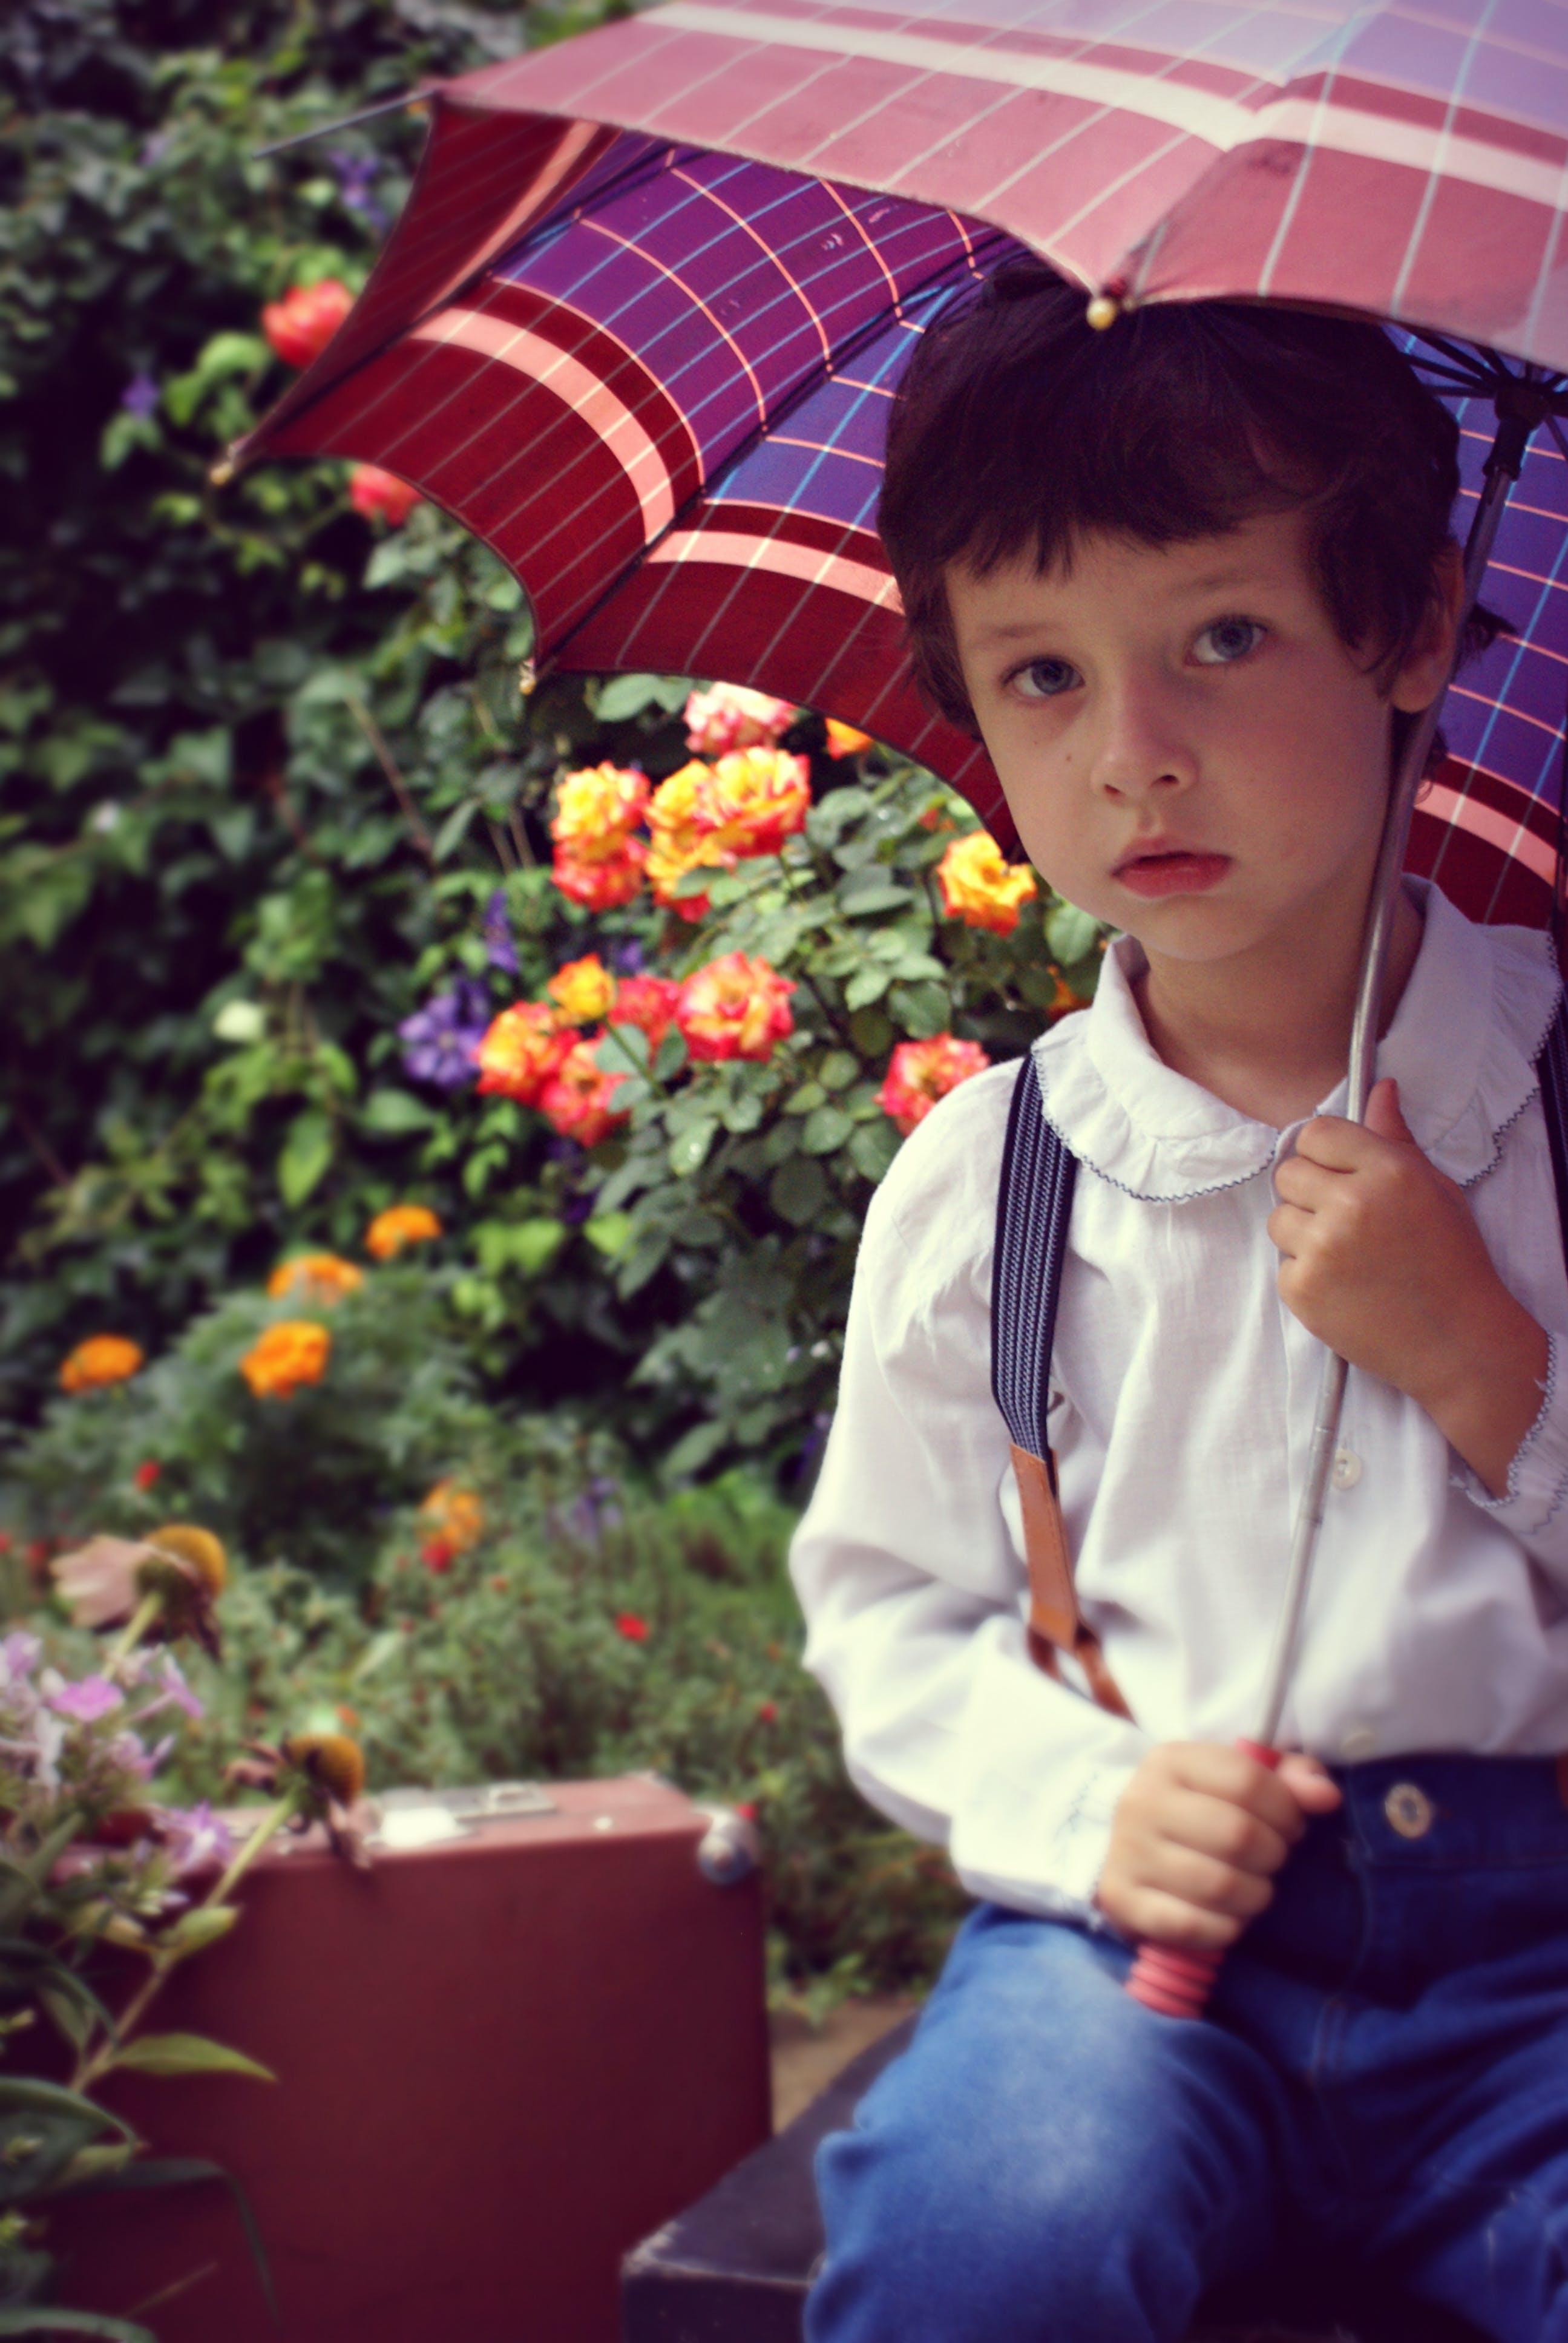 Boy Covering Himself Under Red Umbrella